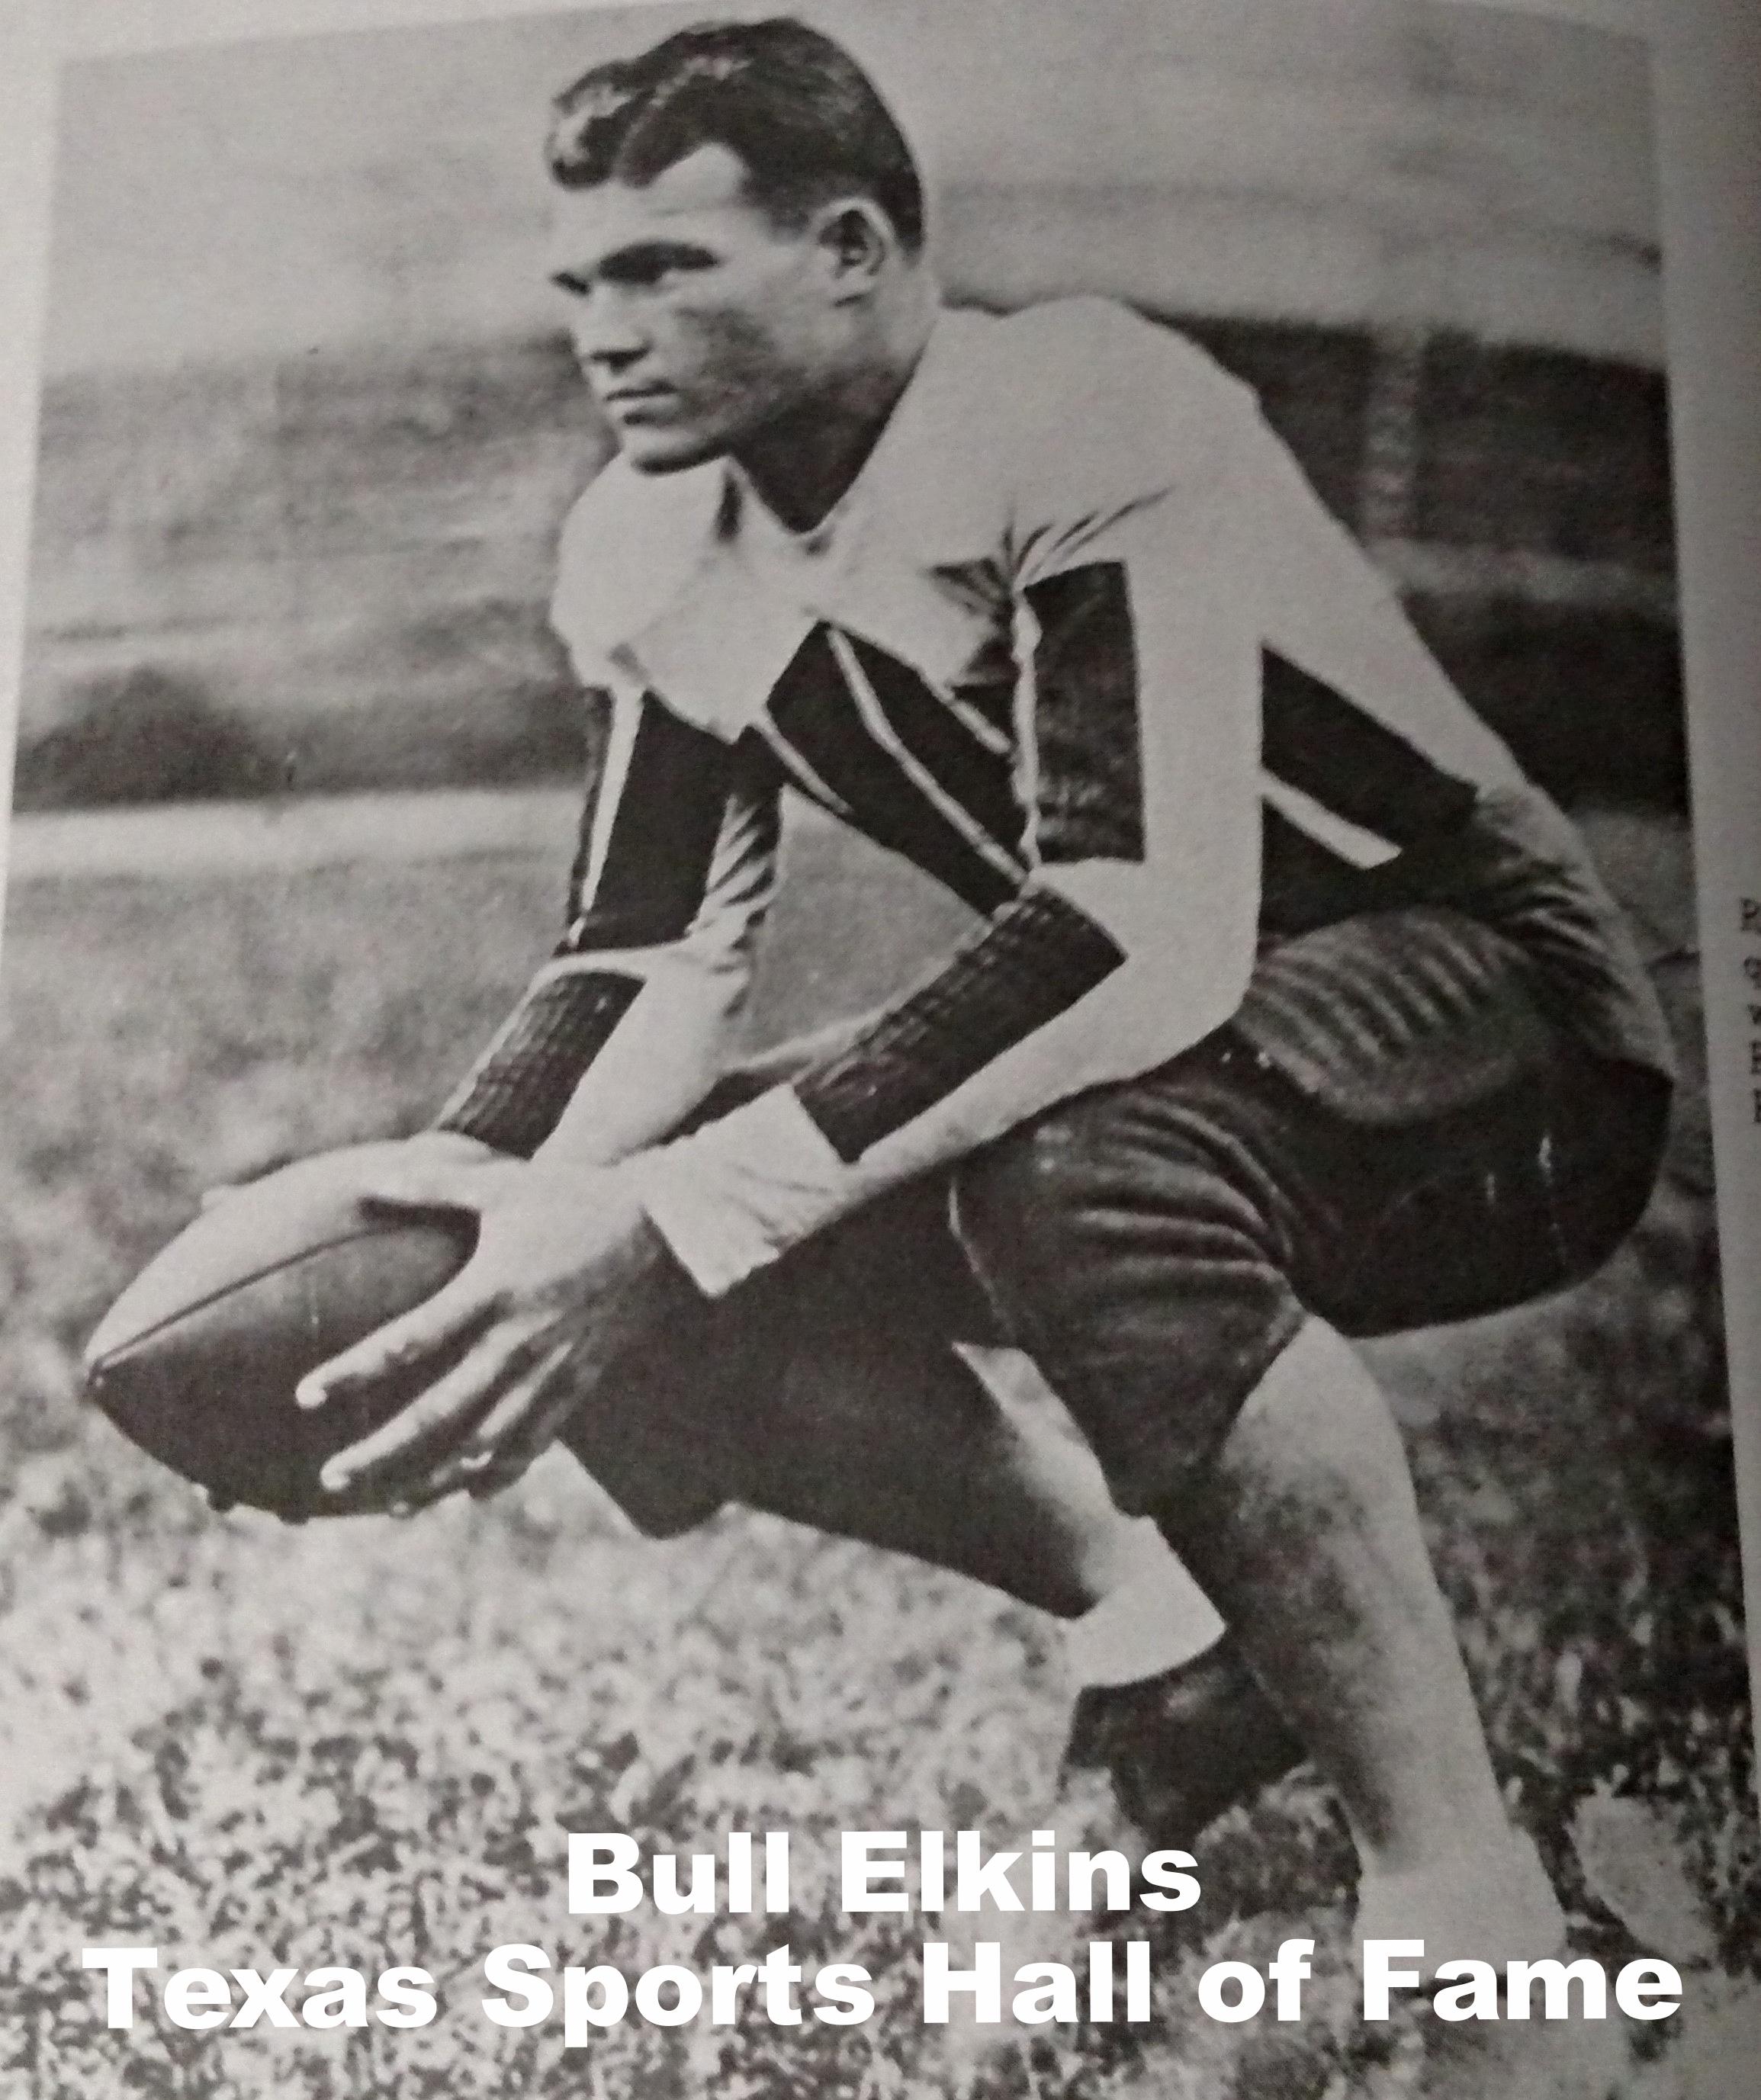 Bull Elkins - 1930 Rhodes Scholar